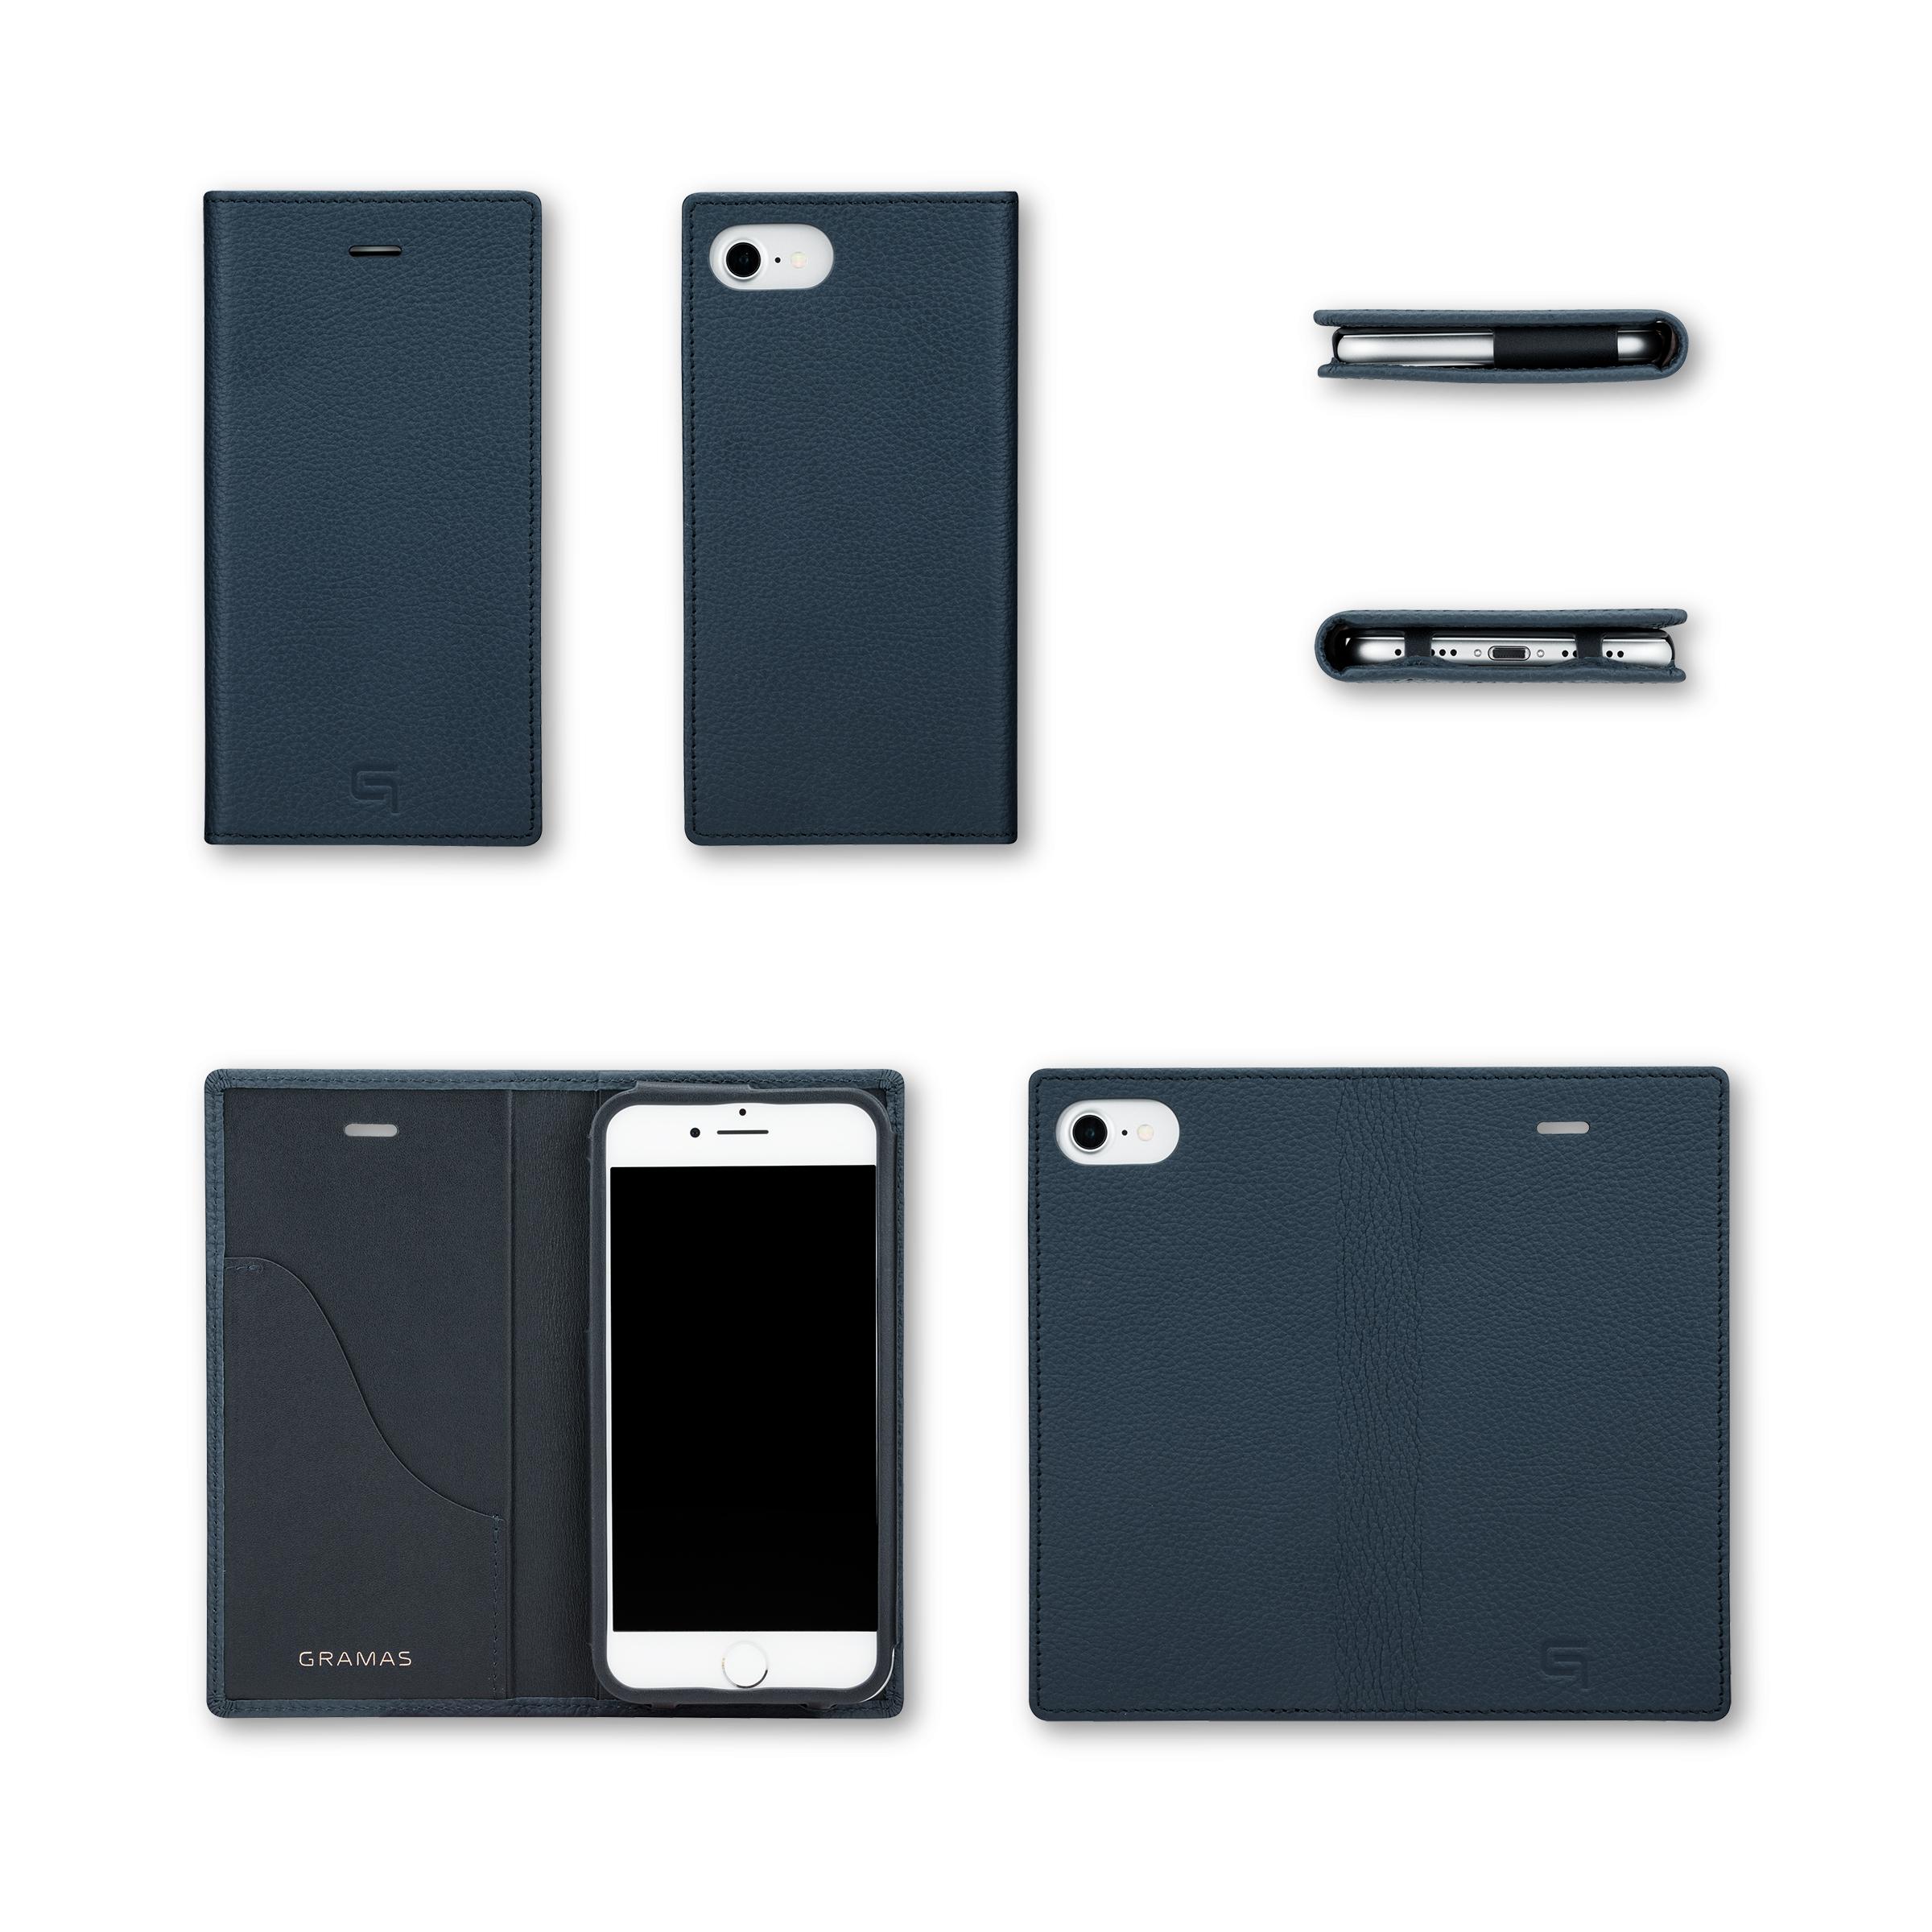 GRAMAS Shrunken-calf Full Leather Case for iPhone 7(Pink) シュランケンカーフ 手帳型フルレザーケース - 画像5